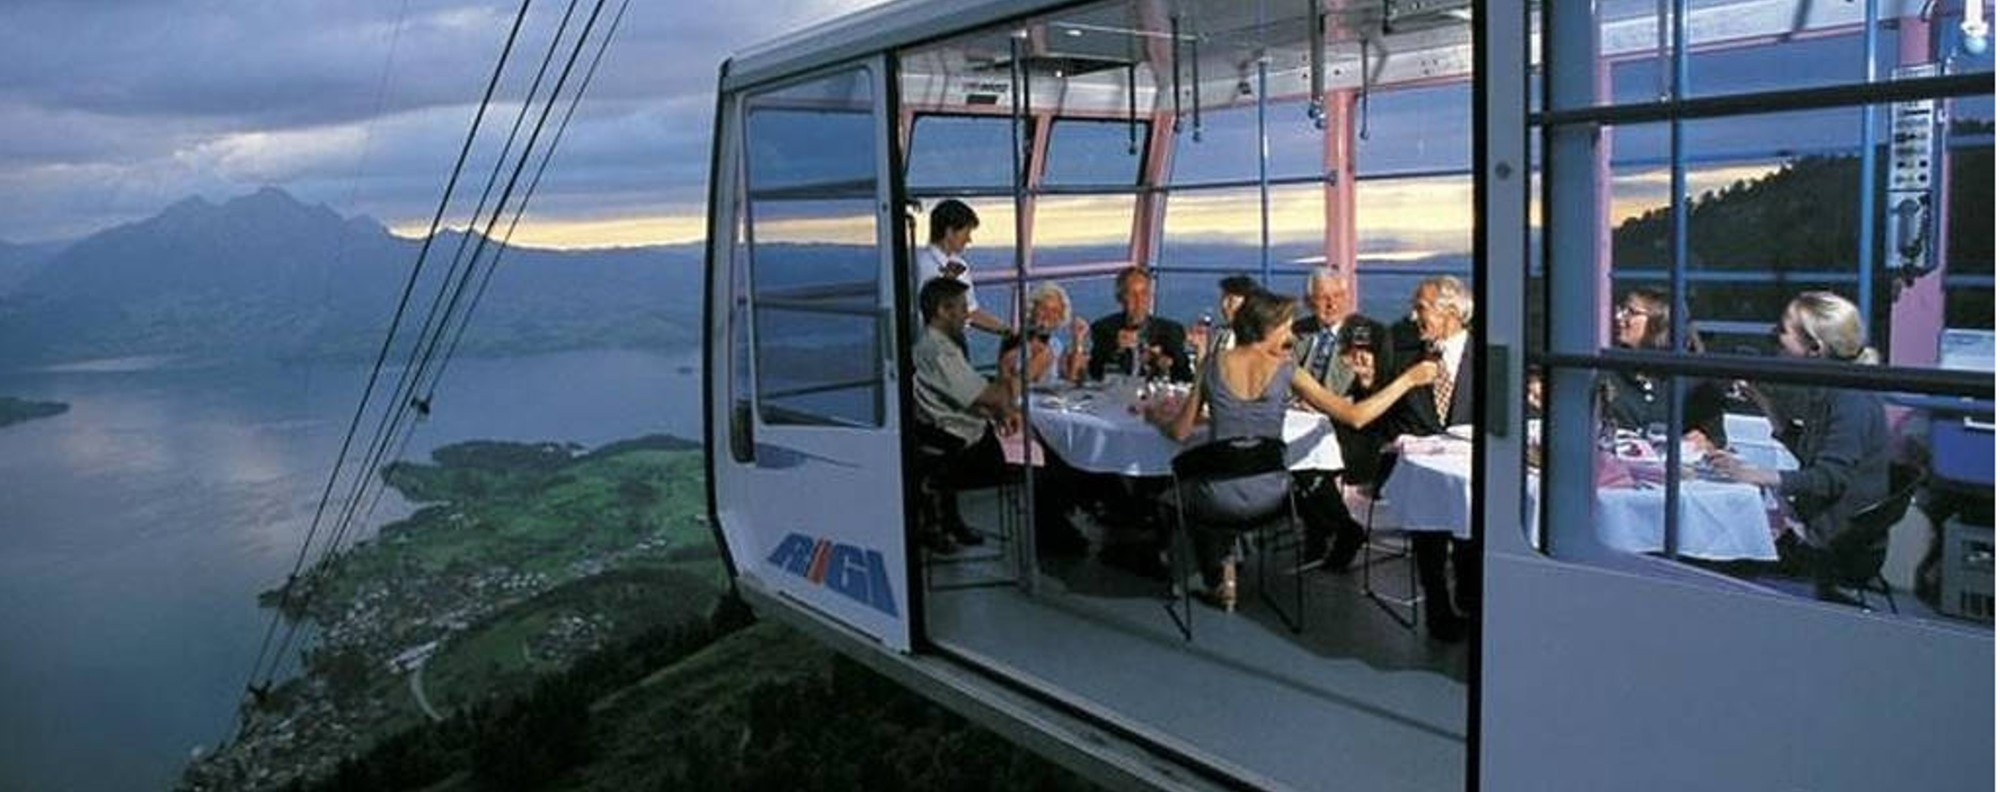 The Restaurant in the Sky, Lucerne, Switzerland.